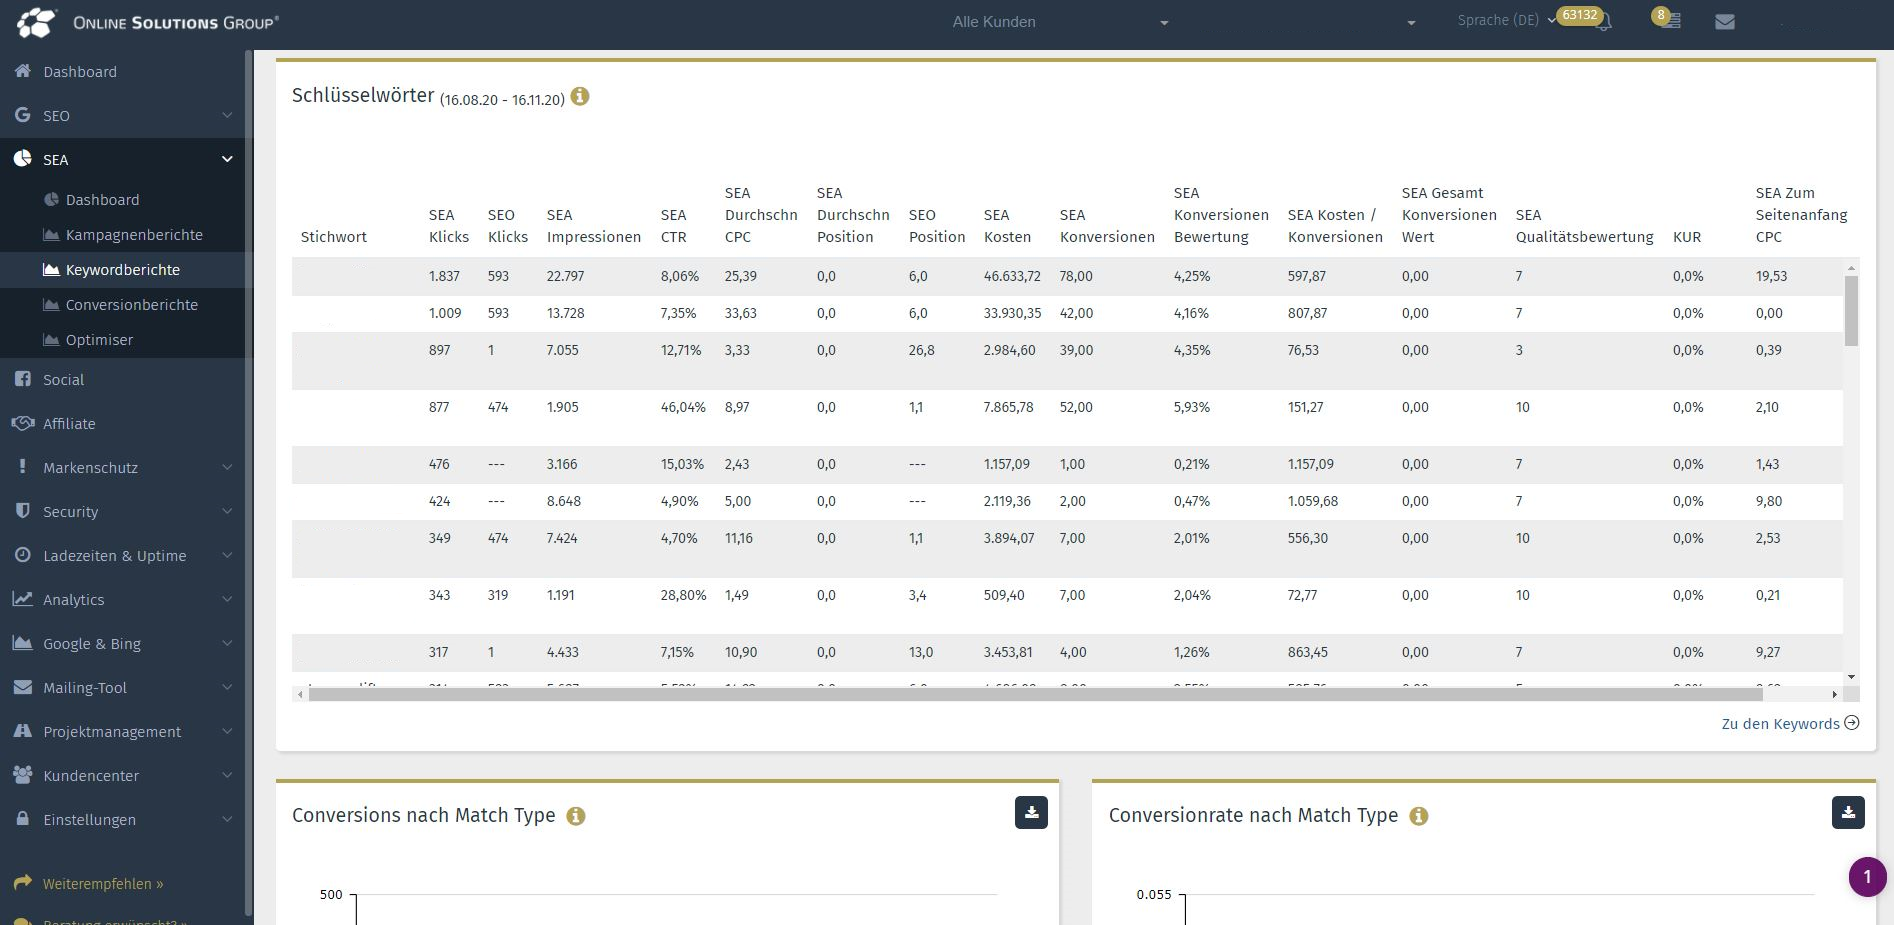 SEA Tool in der Performance Suite: Auswertung je Keyword